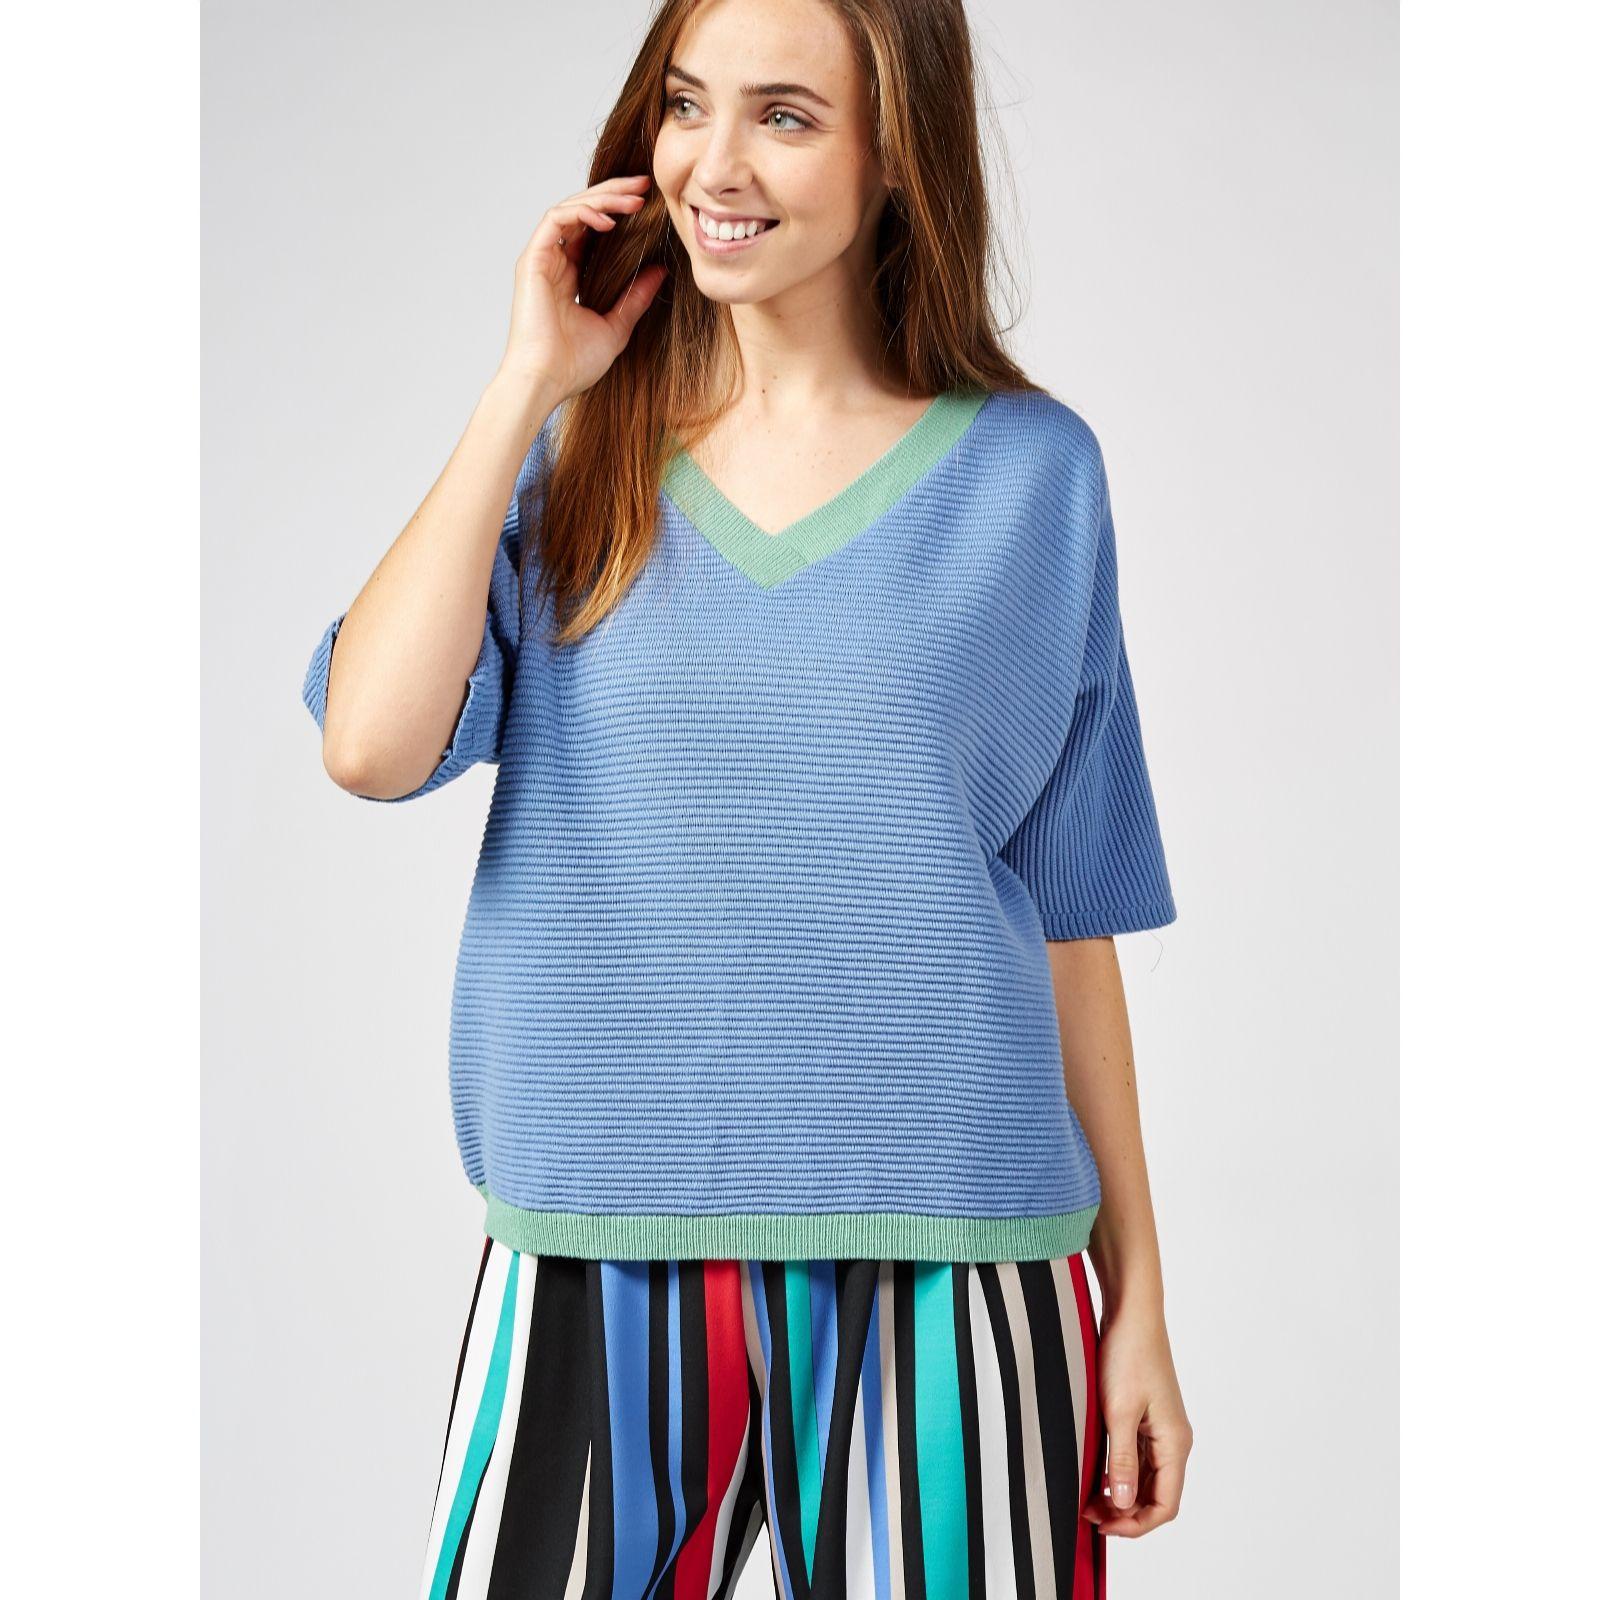 255073be39250a Ben de Lisi Ripple Knit Contrast Trim Kimono Sleeve Sweater - QVC UK